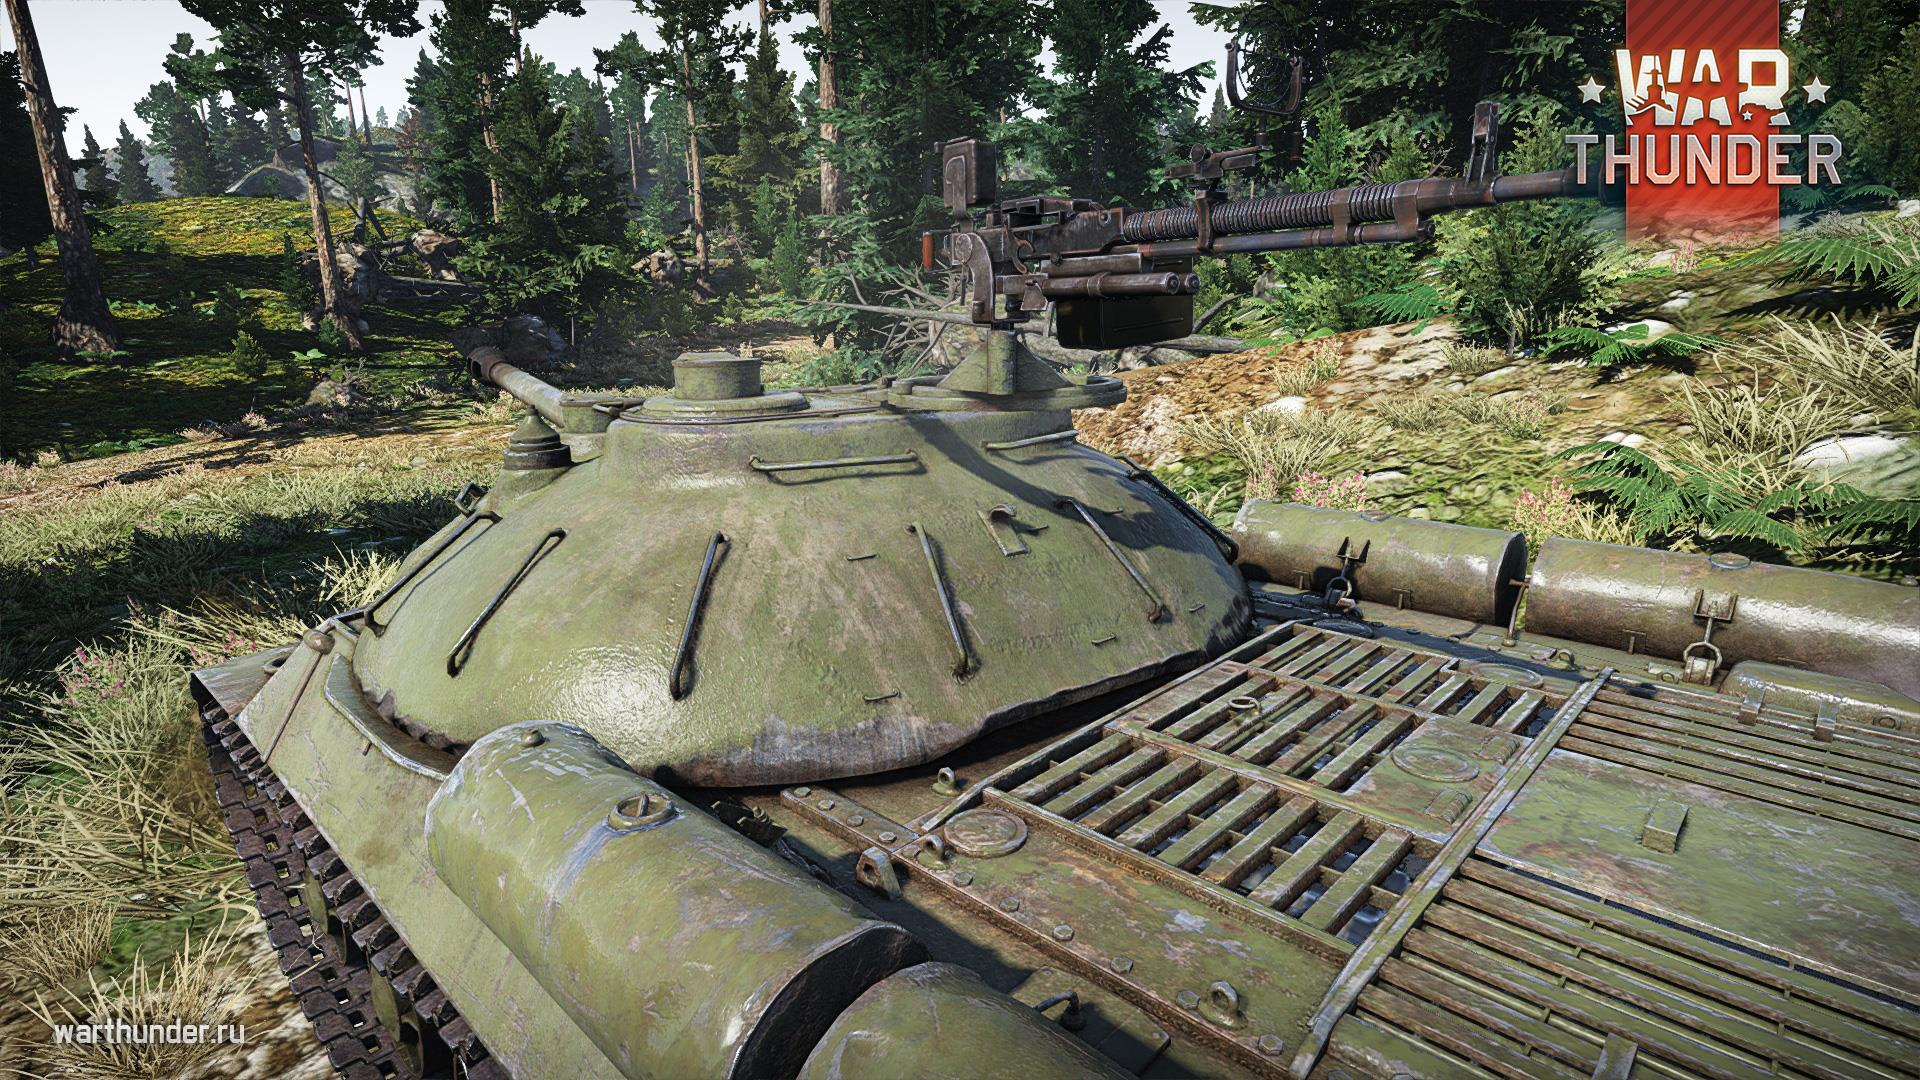 War thunder ground forces gamepad